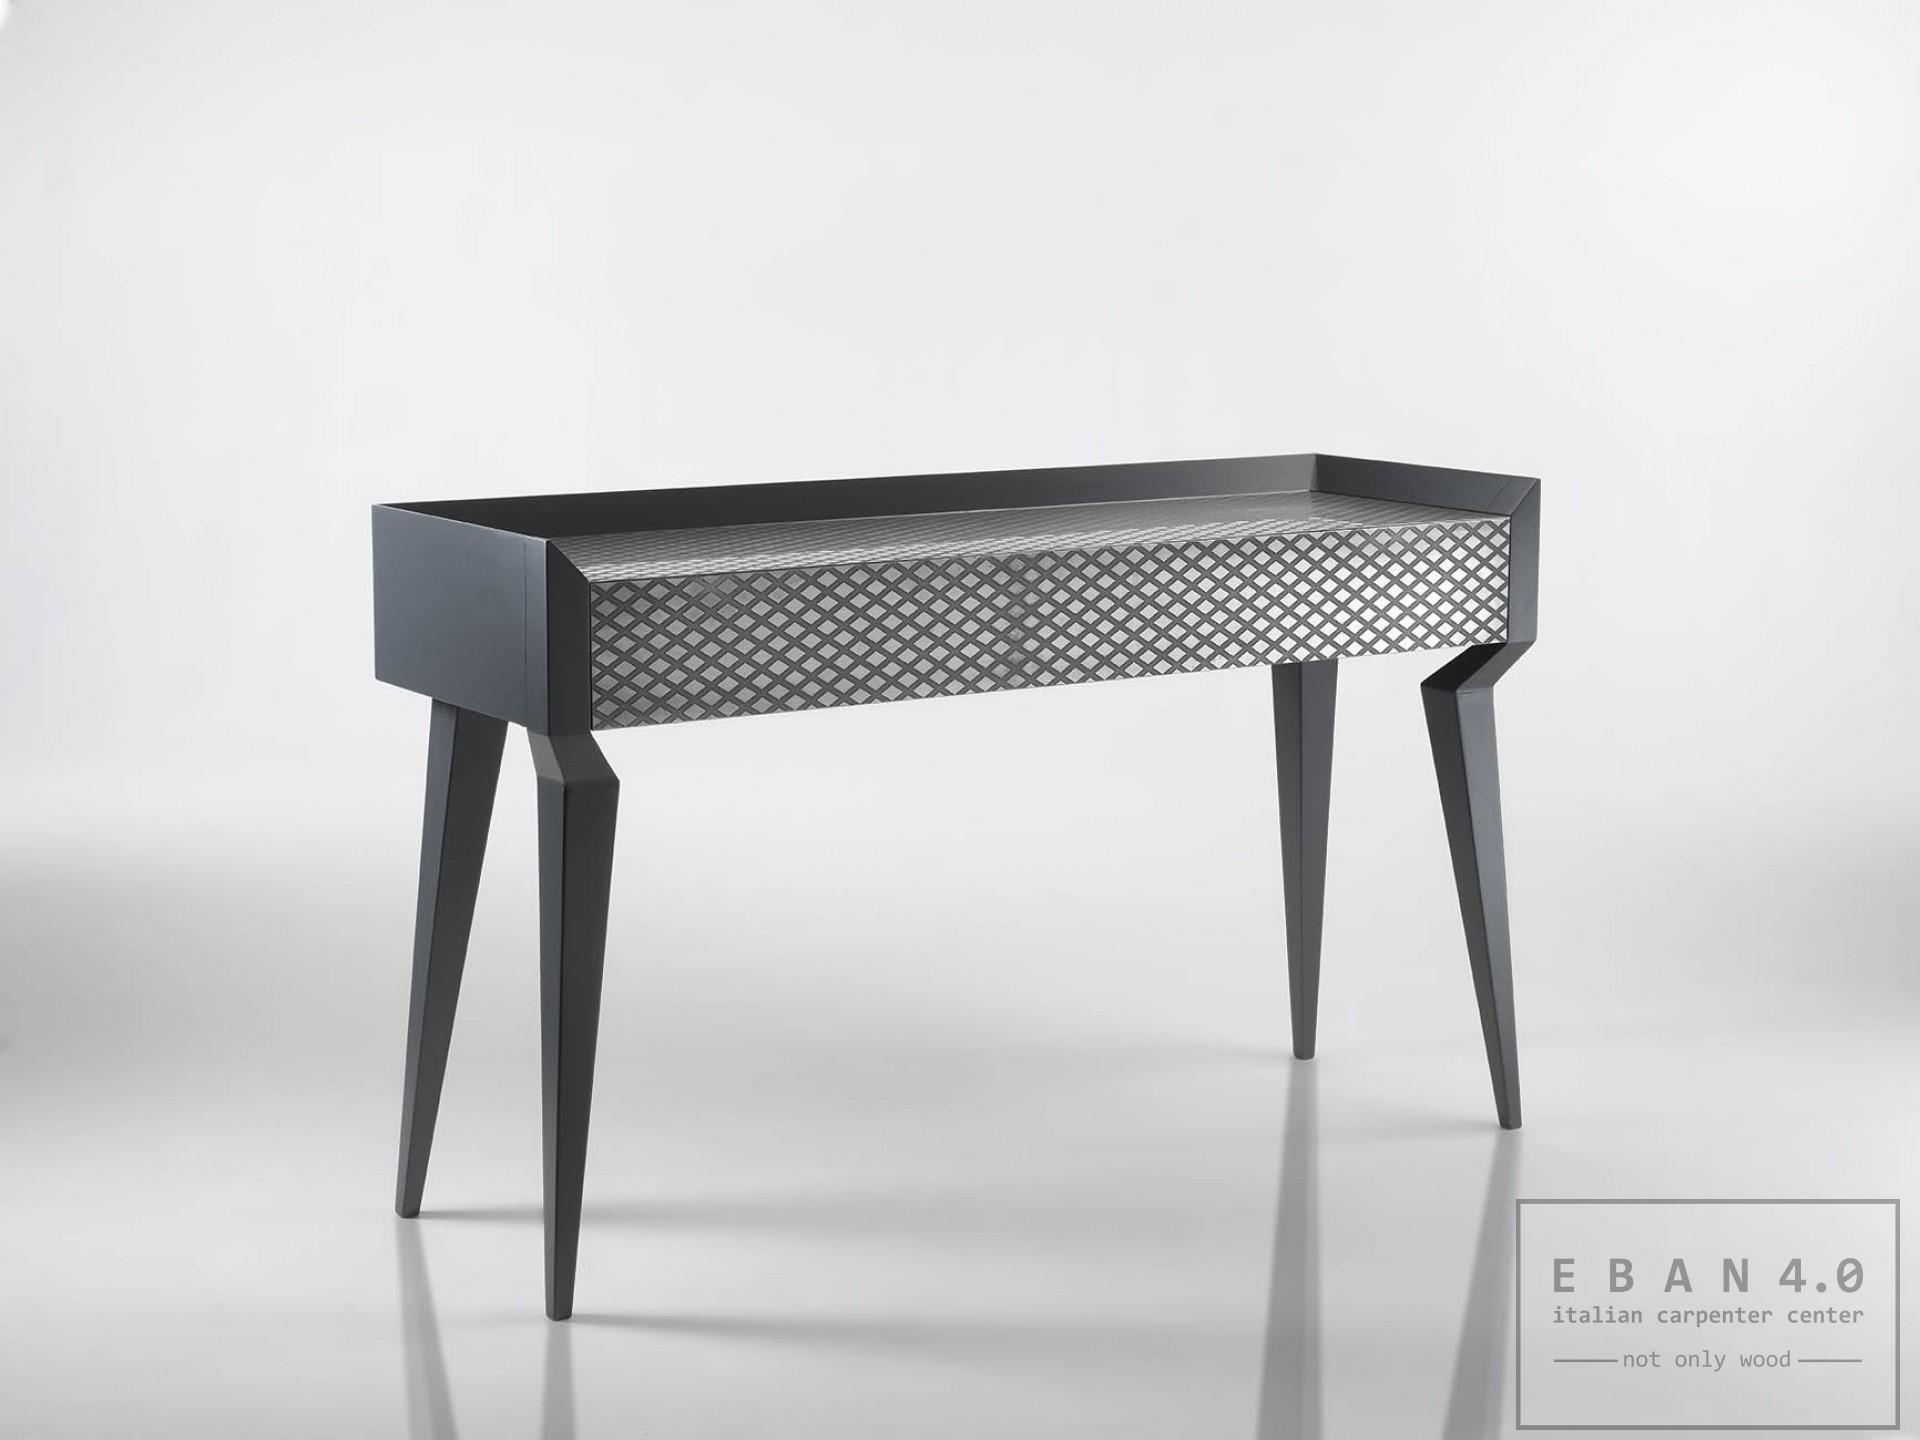 Console deer | consolle deereban 4.0, 2016140x 45 x 85 cm